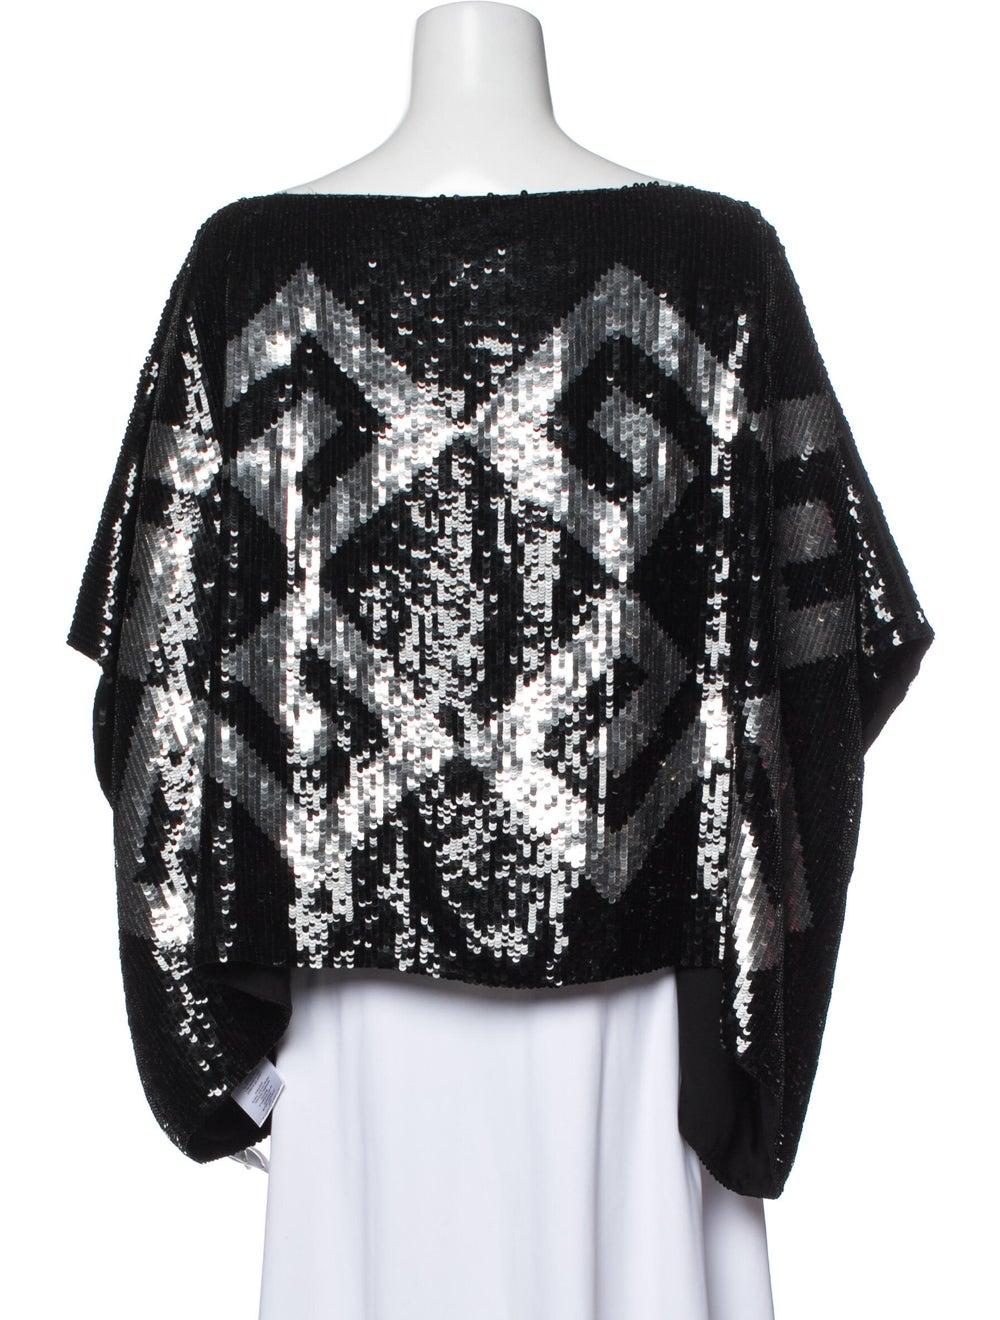 Givenchy Silk Printed Blouse Black - image 3